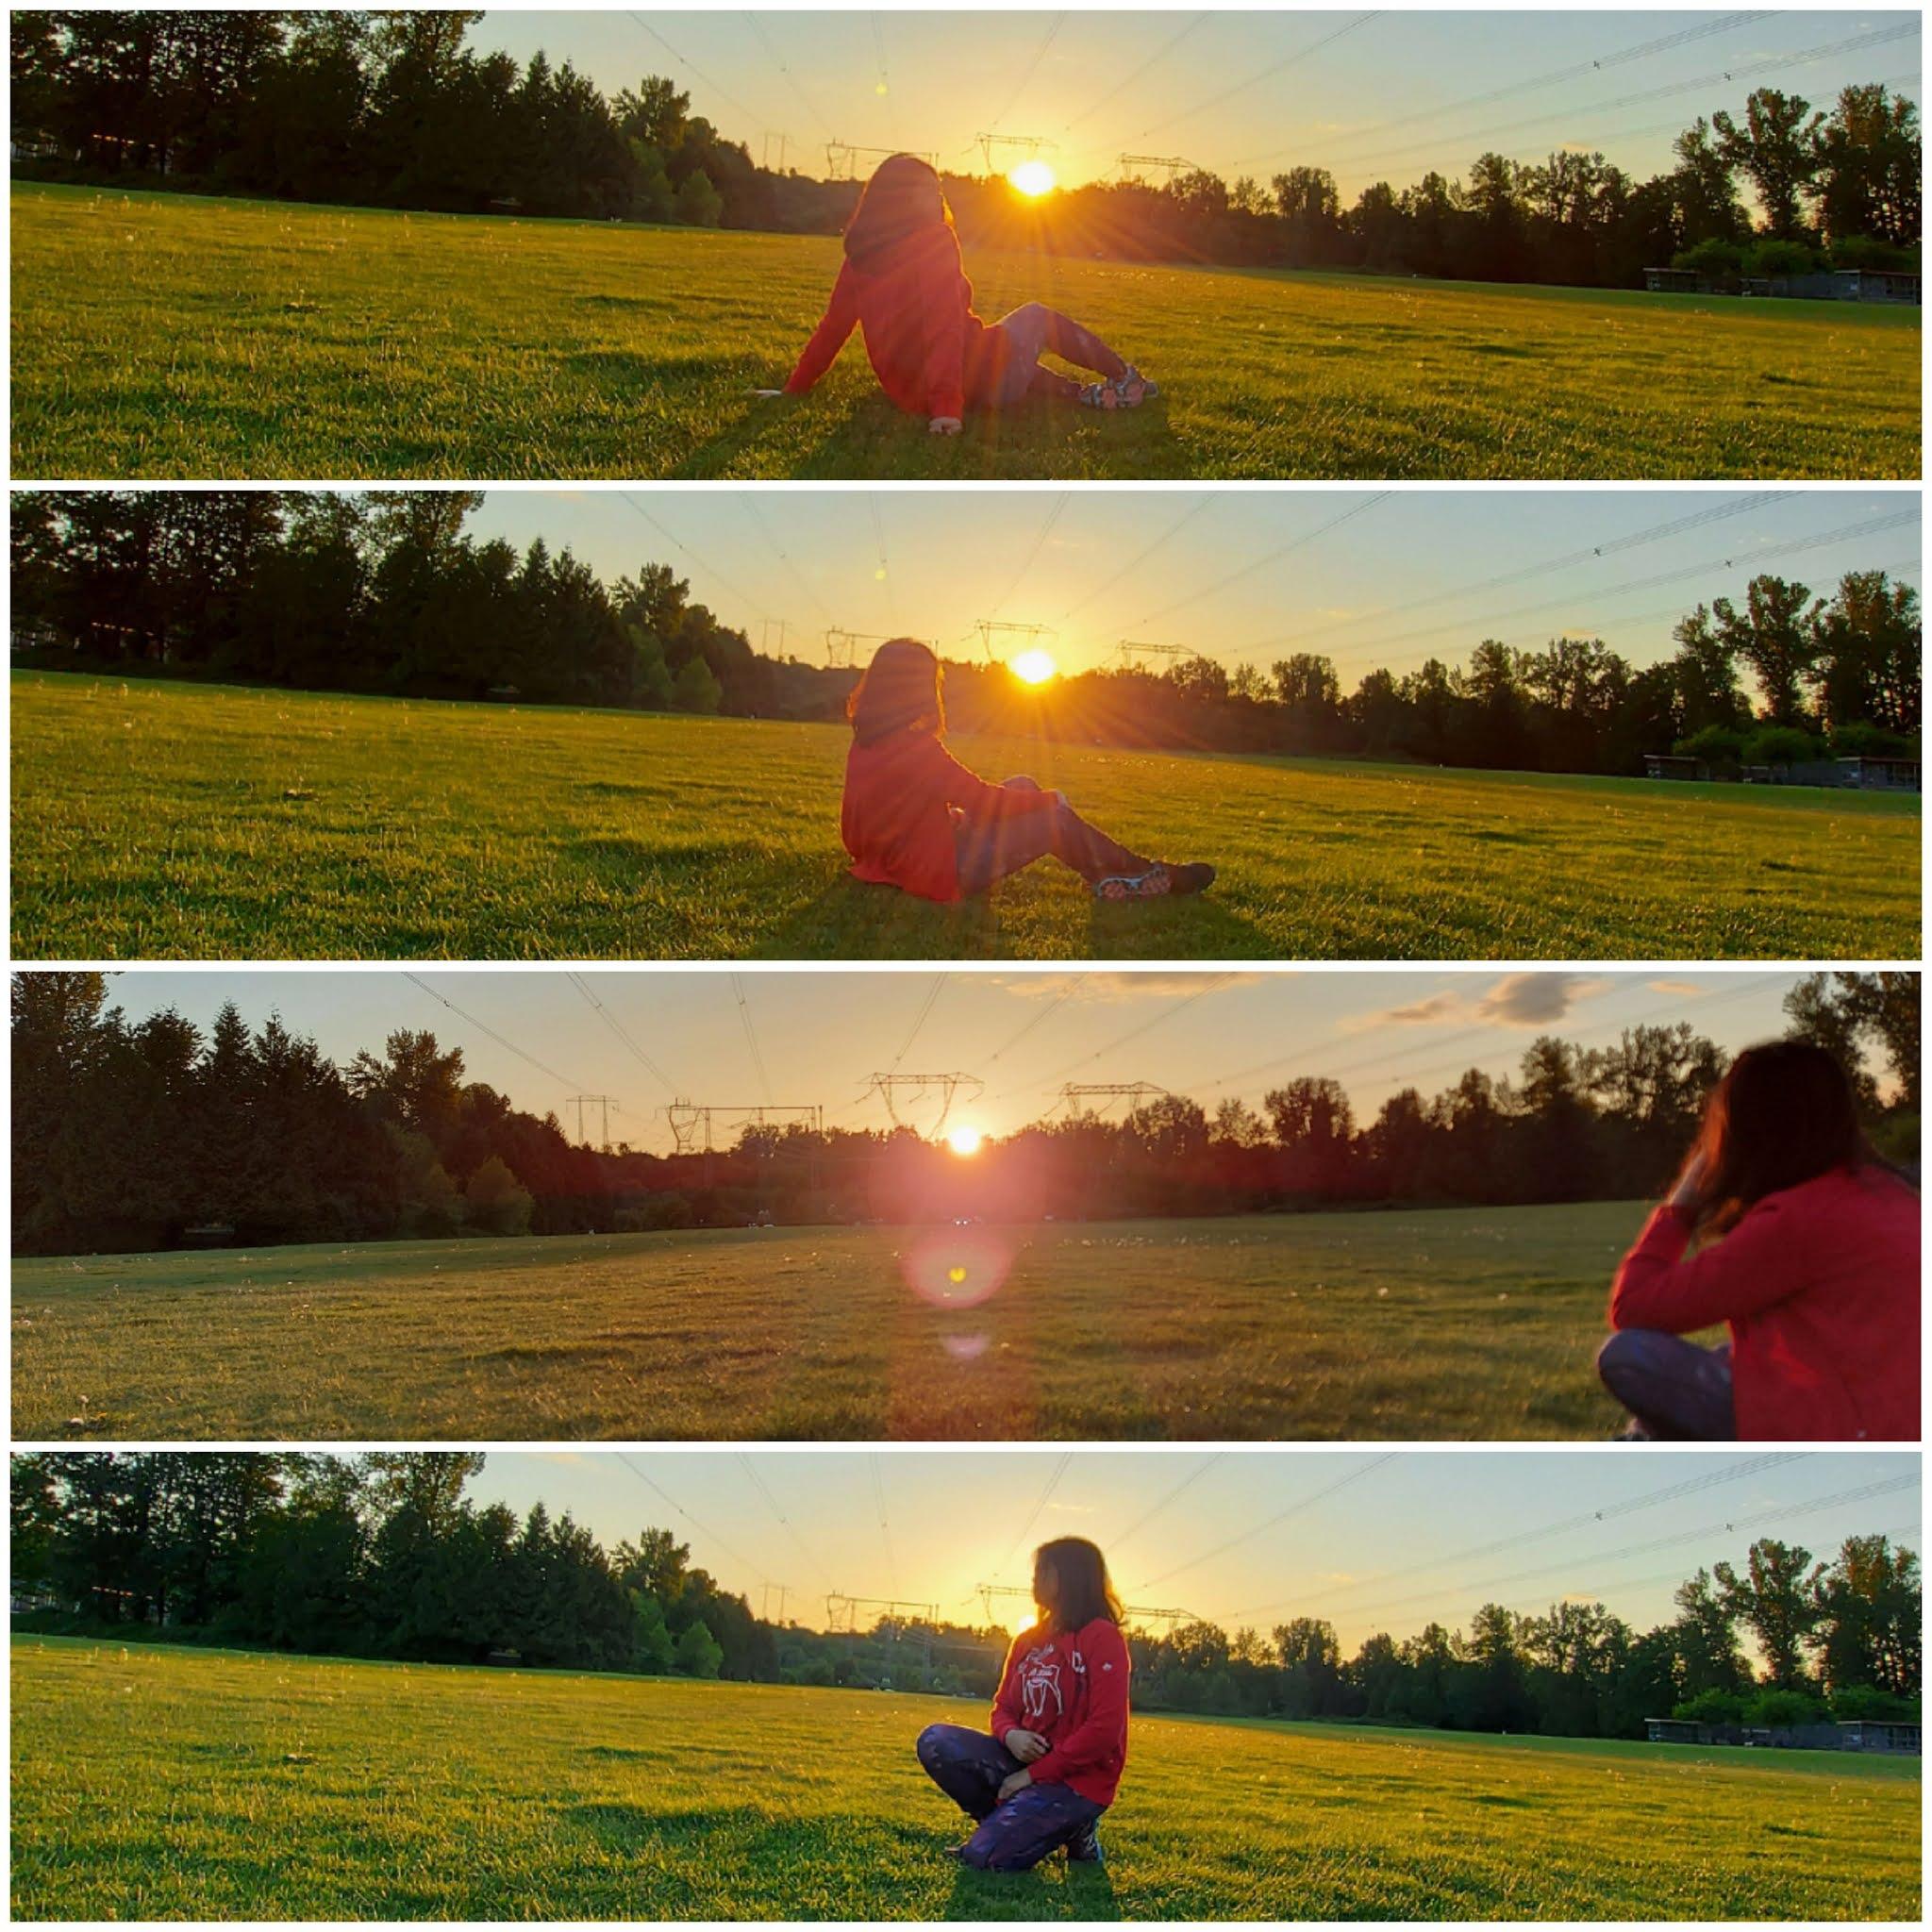 #Sunset #Photograph